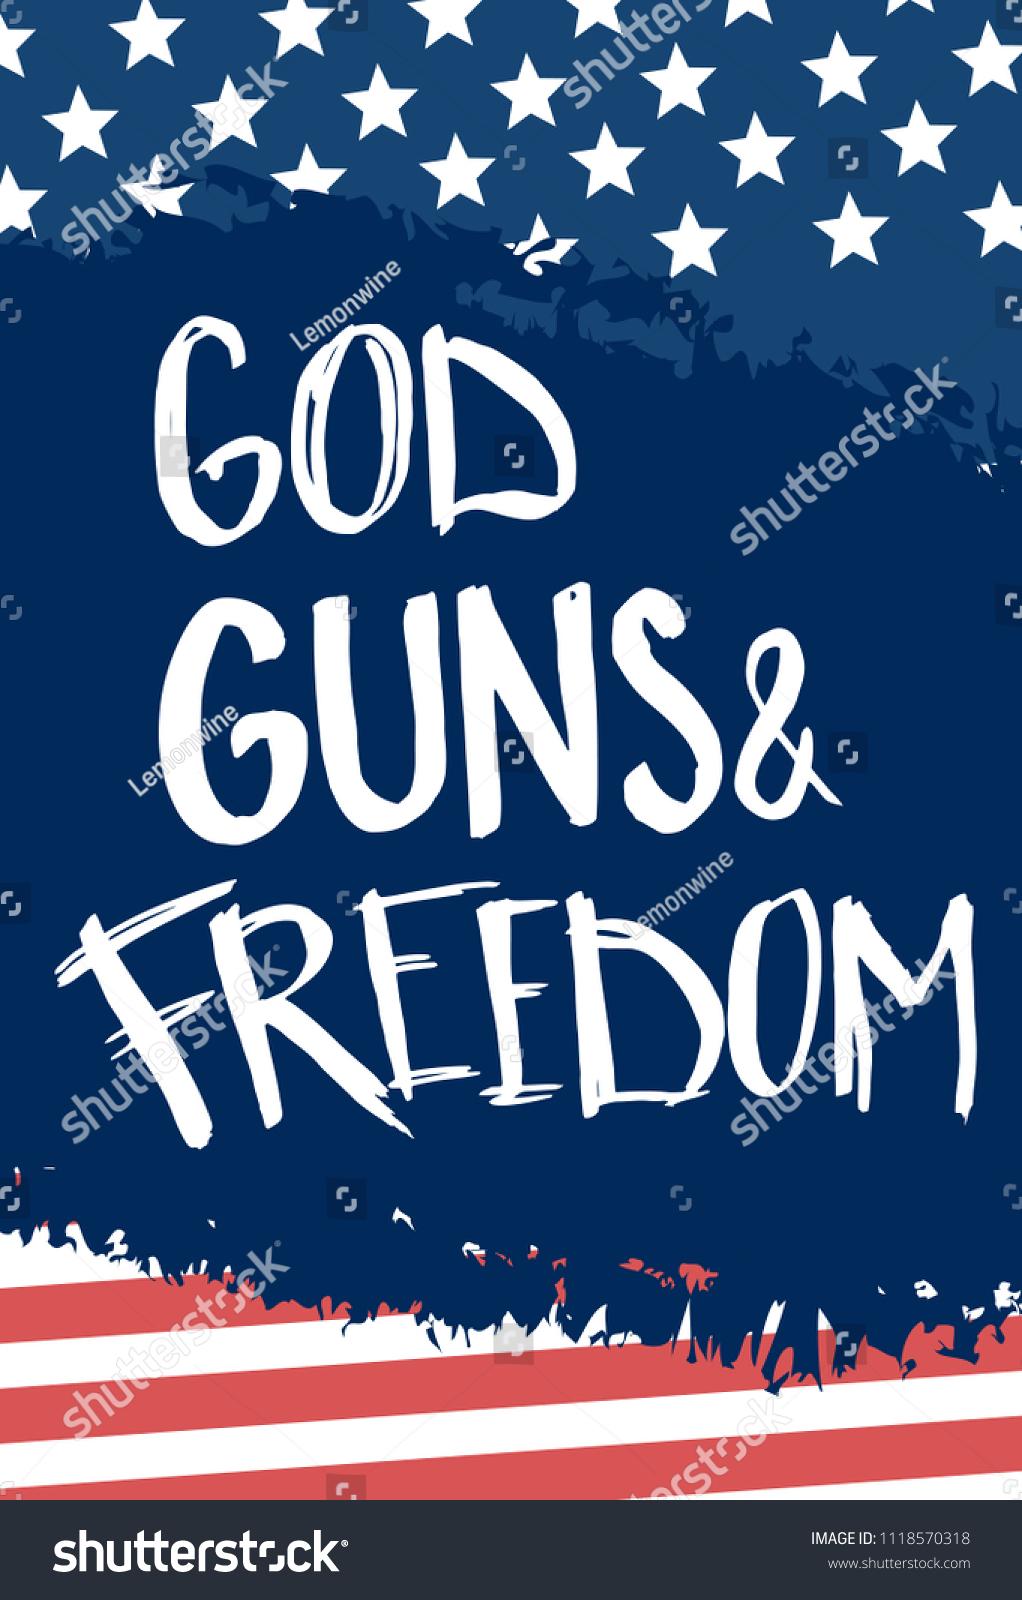 God Guns Freedom 4 July America Stock Vector Royalty Free 1118570318